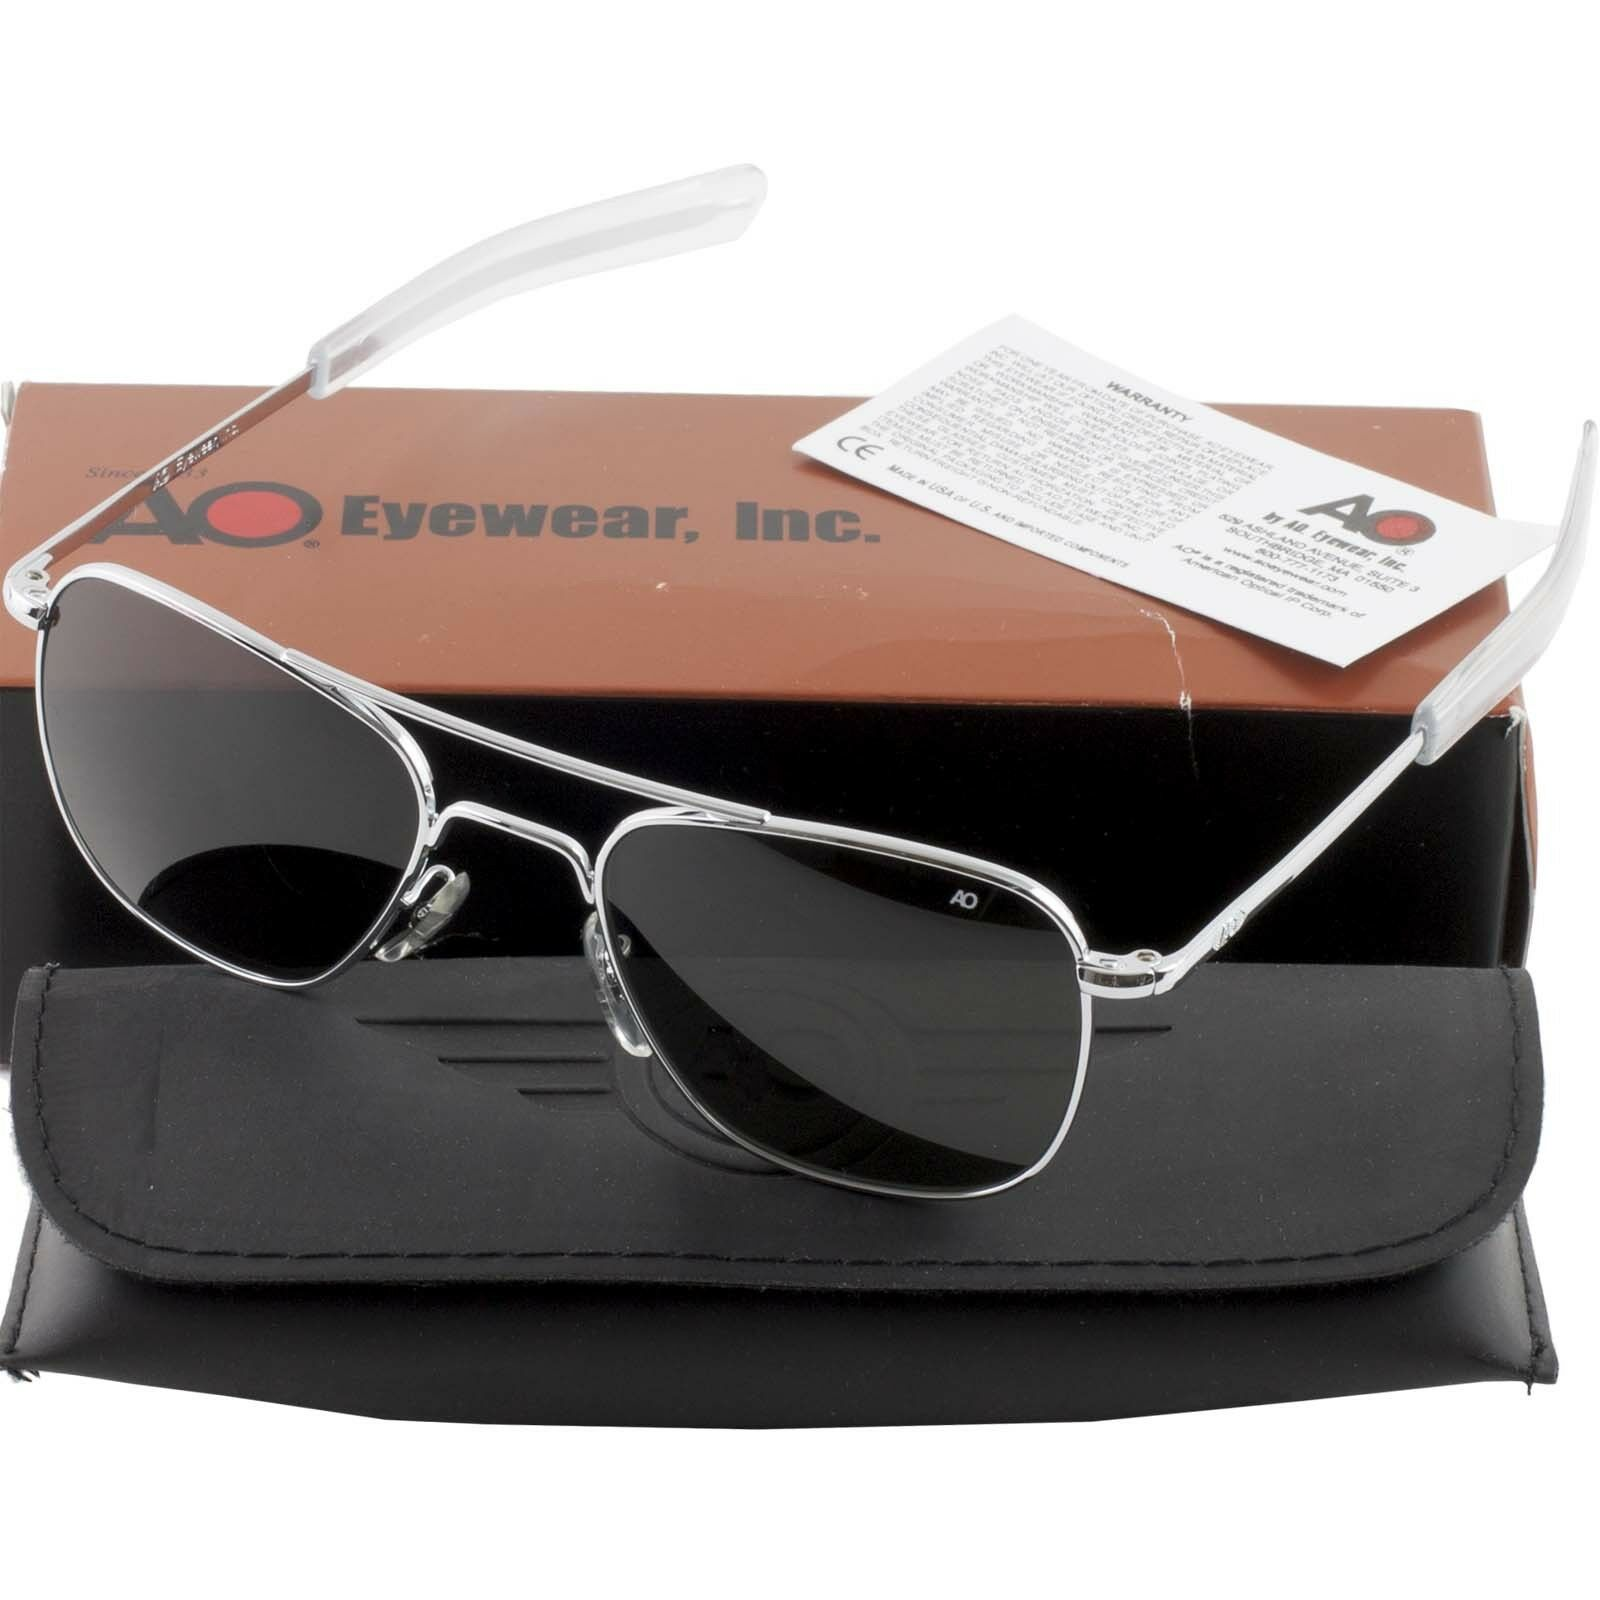 2ef16eae04 AO American Optical Military Aviator Silver Frames 52 mm Sunglasses Gray  Lens